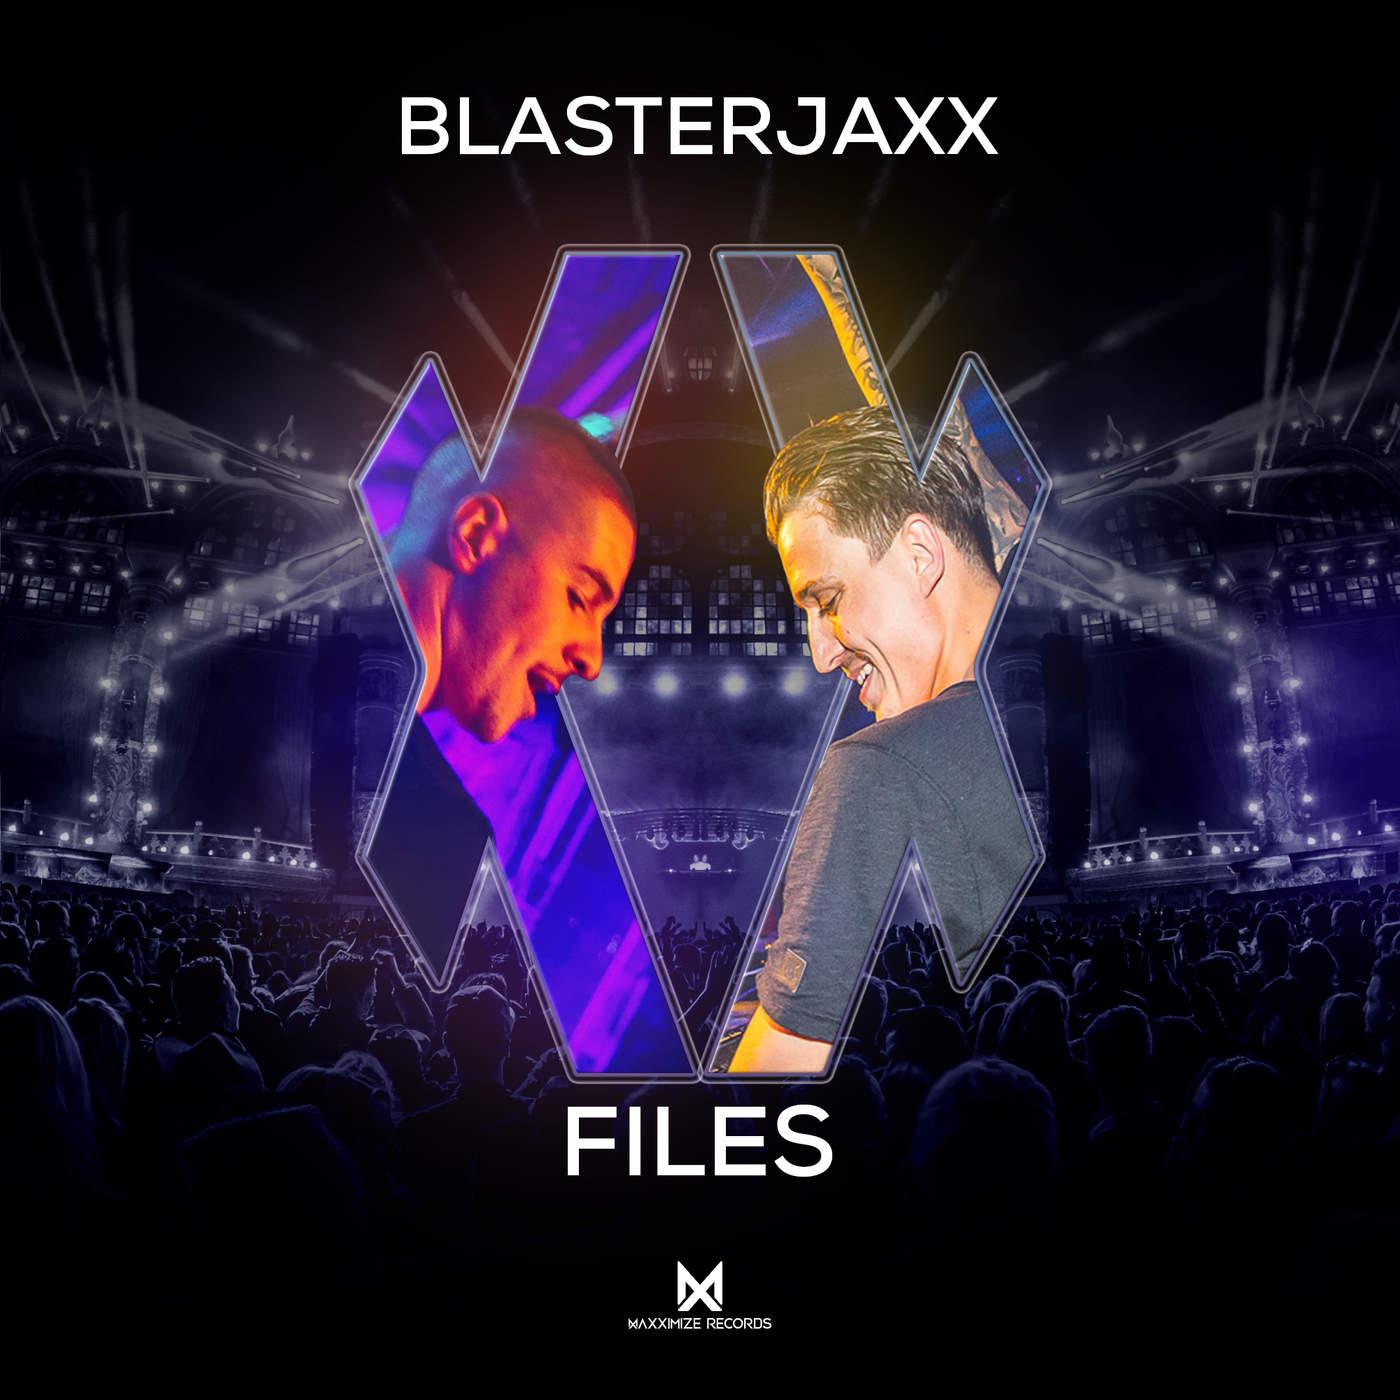 BlasterJaxx - XX Files - EP Cover